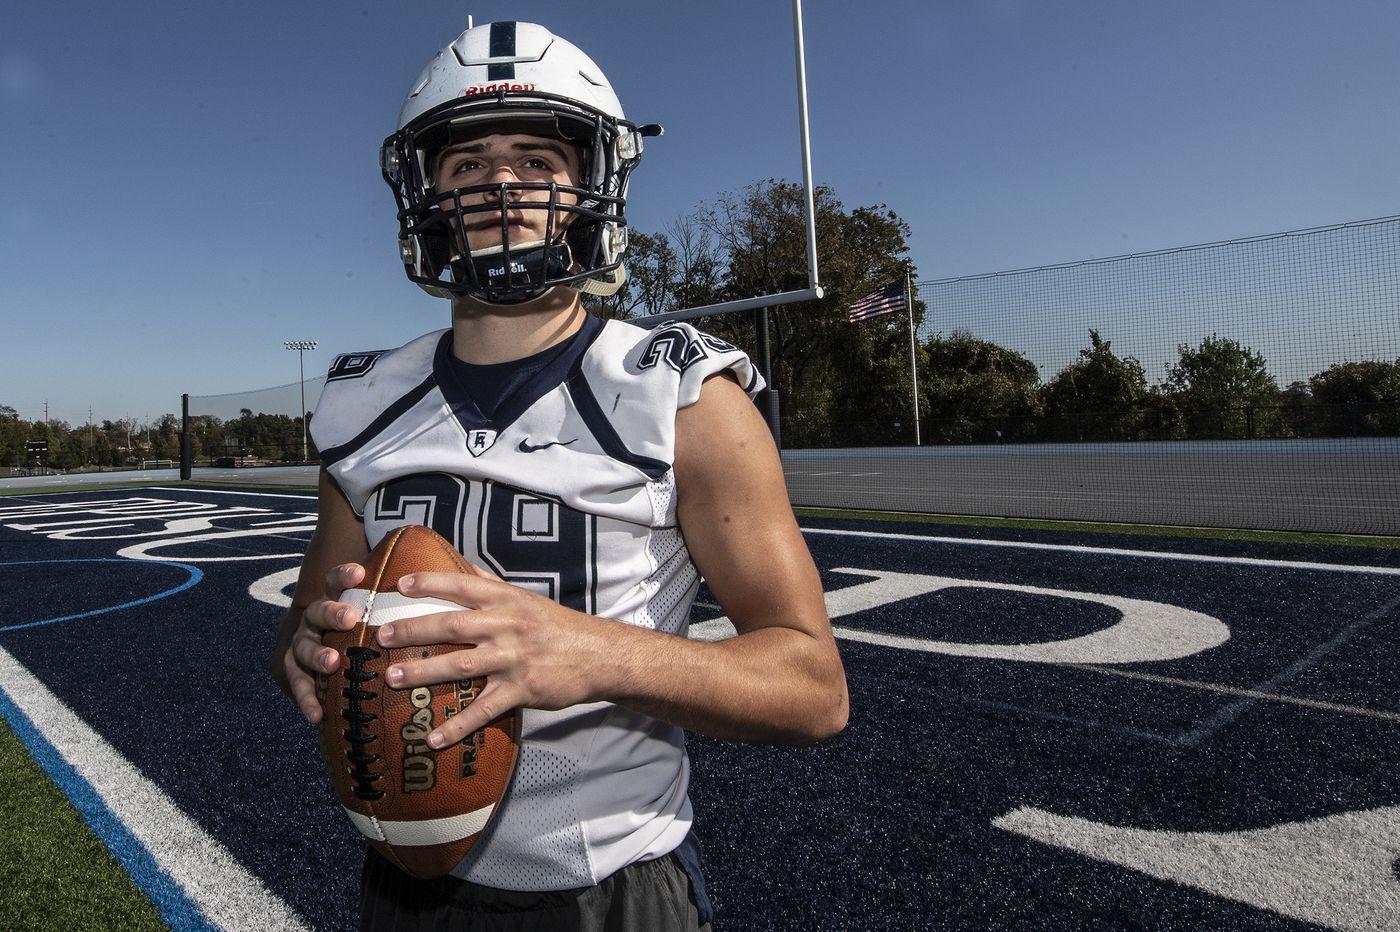 Episcopal Academy's Matt Bush does the dirty work for an undefeated football team